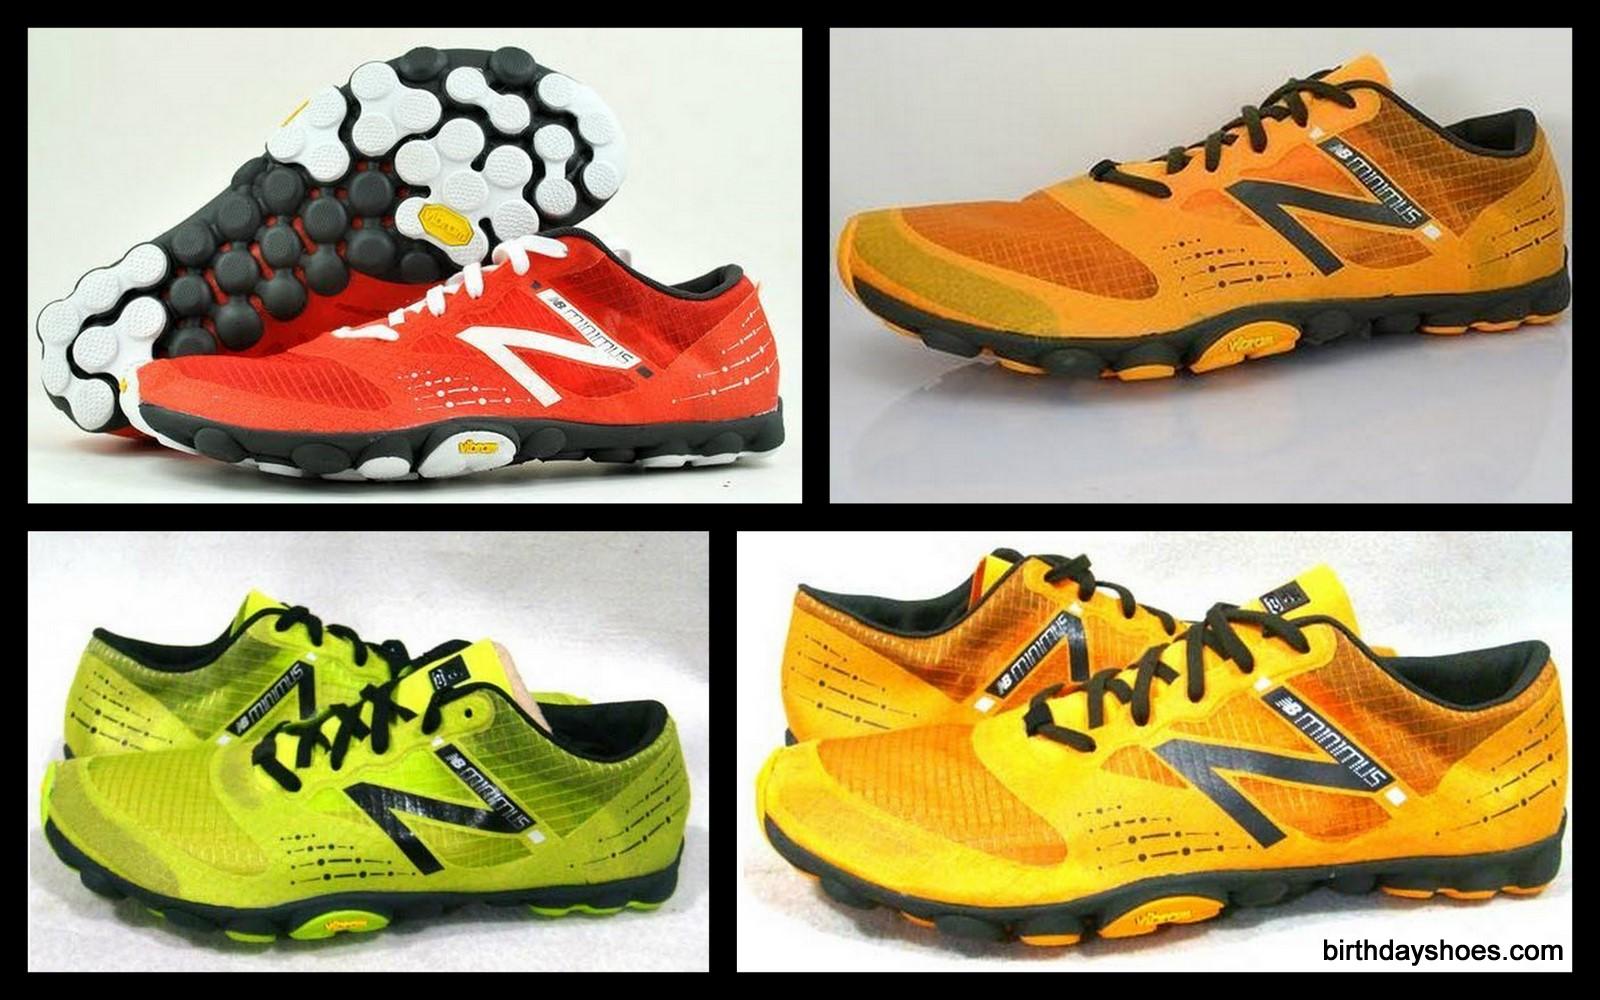 More New Balance NB Minimus Zero Leaked Photos? - Birthday Shoes ...